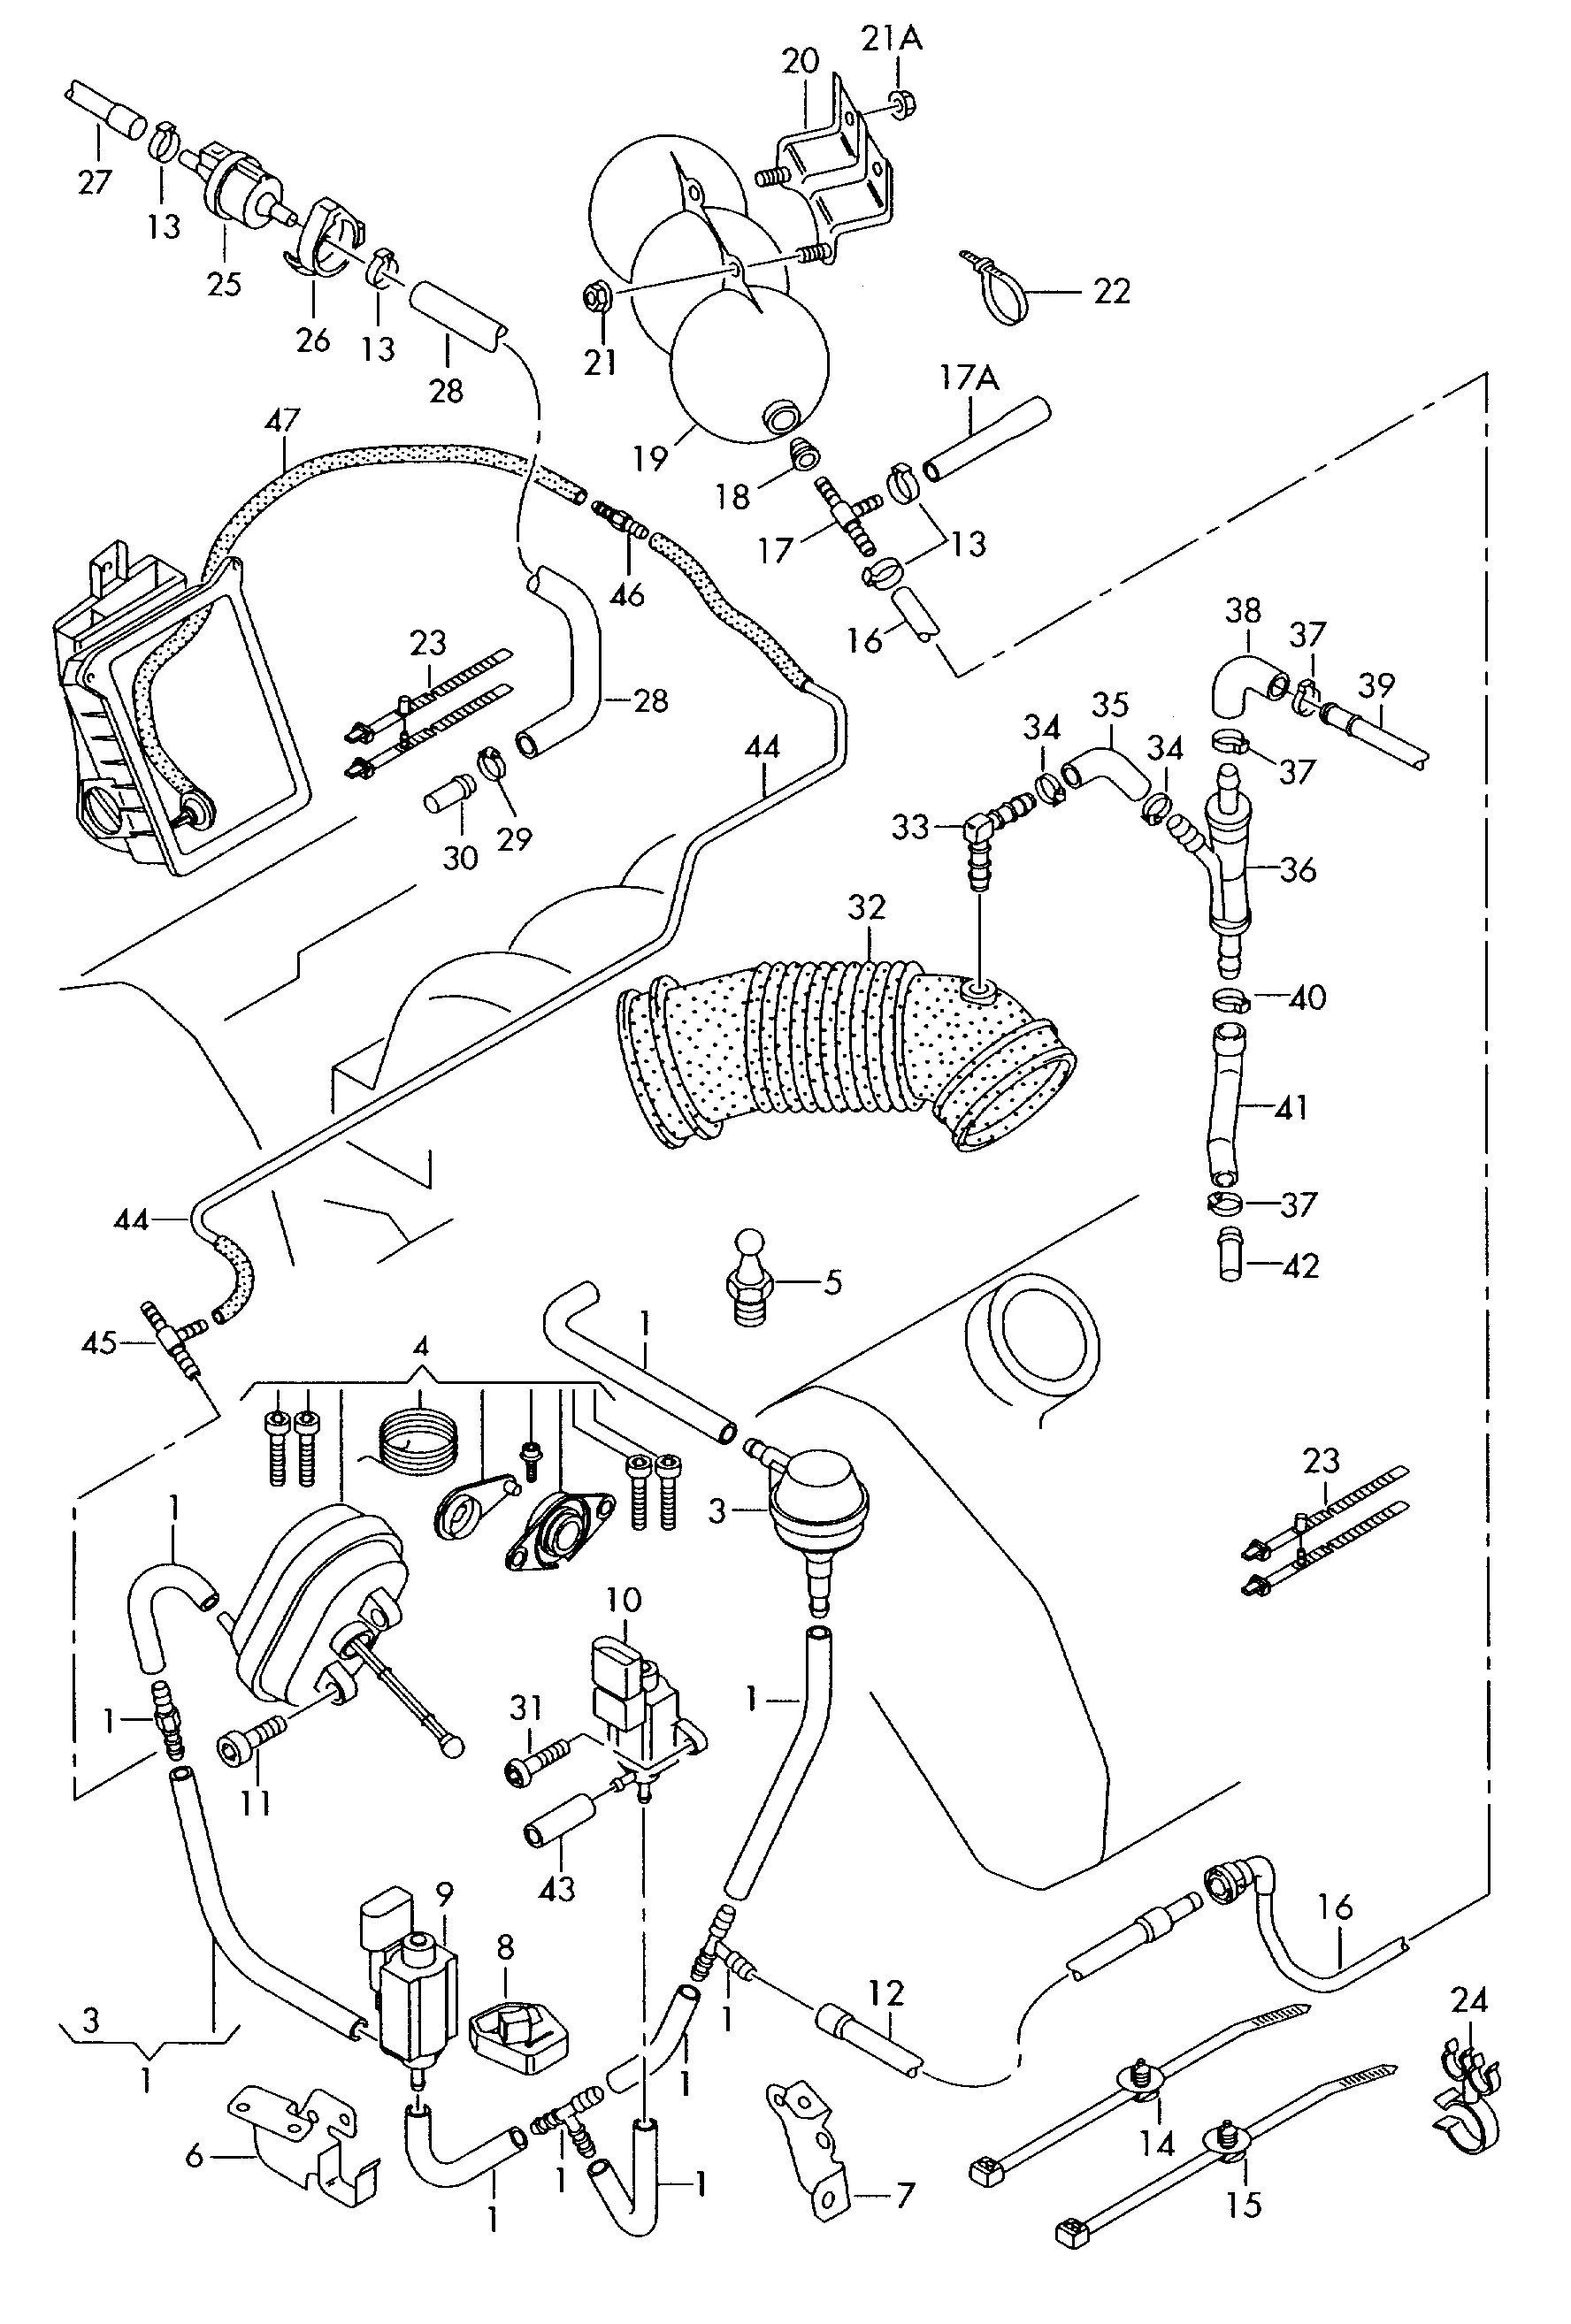 Please Help Id Ing This Broken Tube In Engine Bay S4 B7